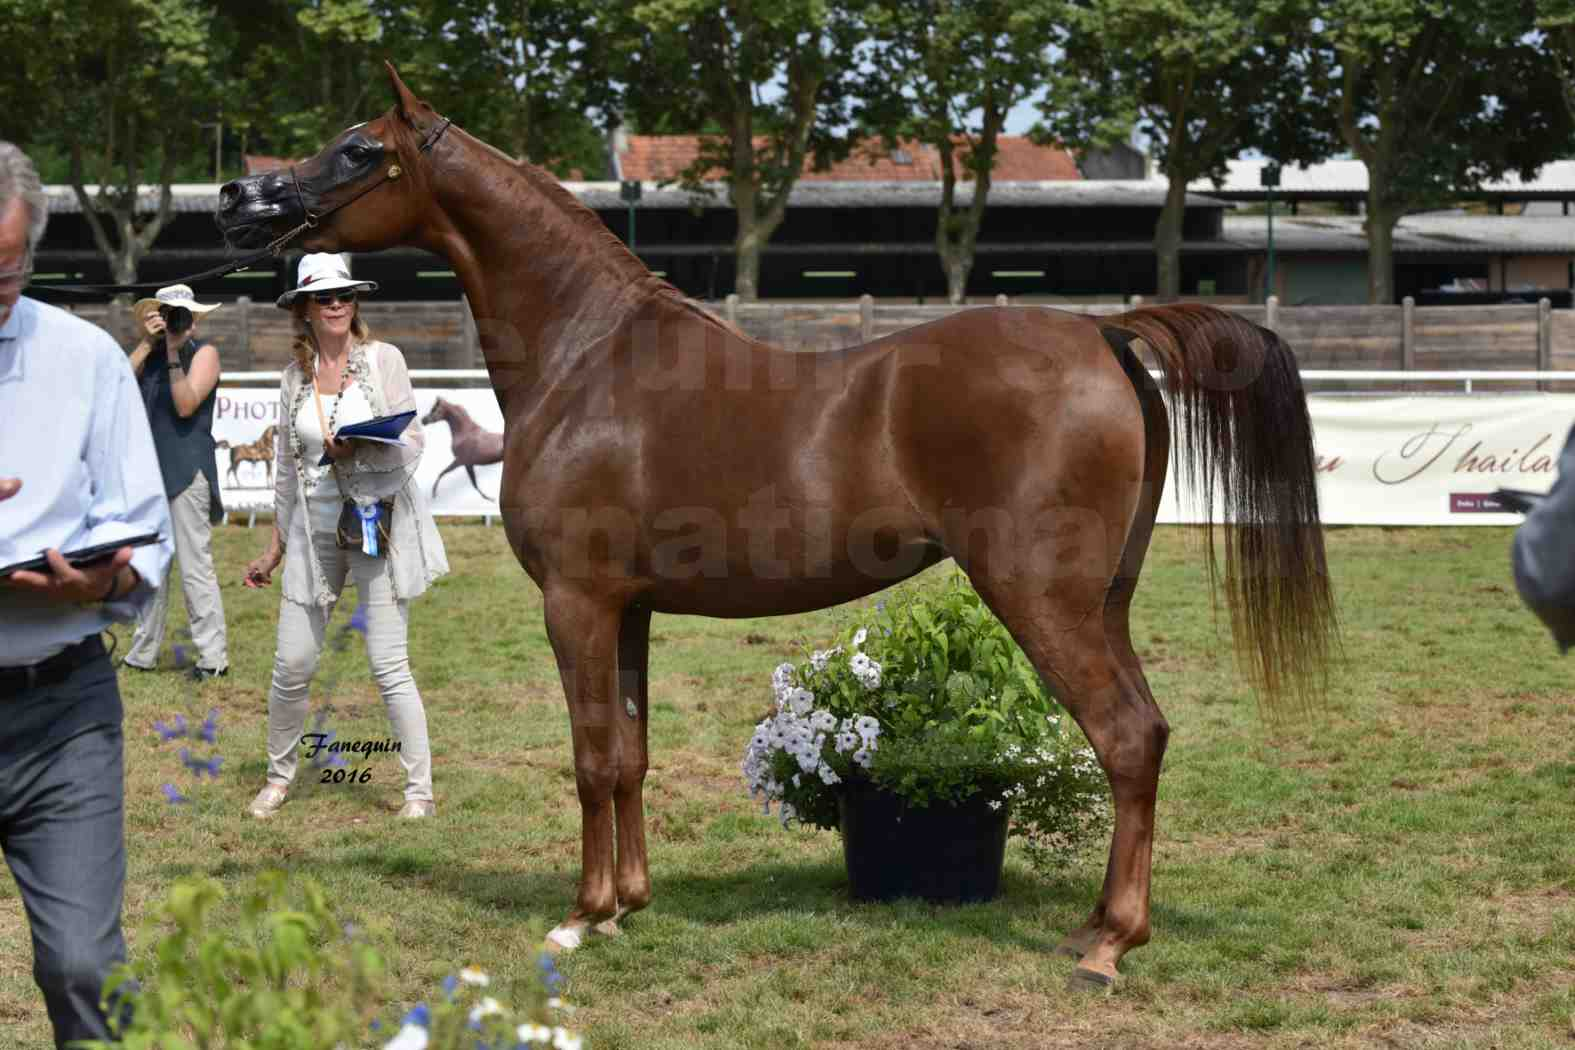 International Arabian Horse Show B de VICHY 2016 - PEARL DE DJOON - Notre Sélection - 42